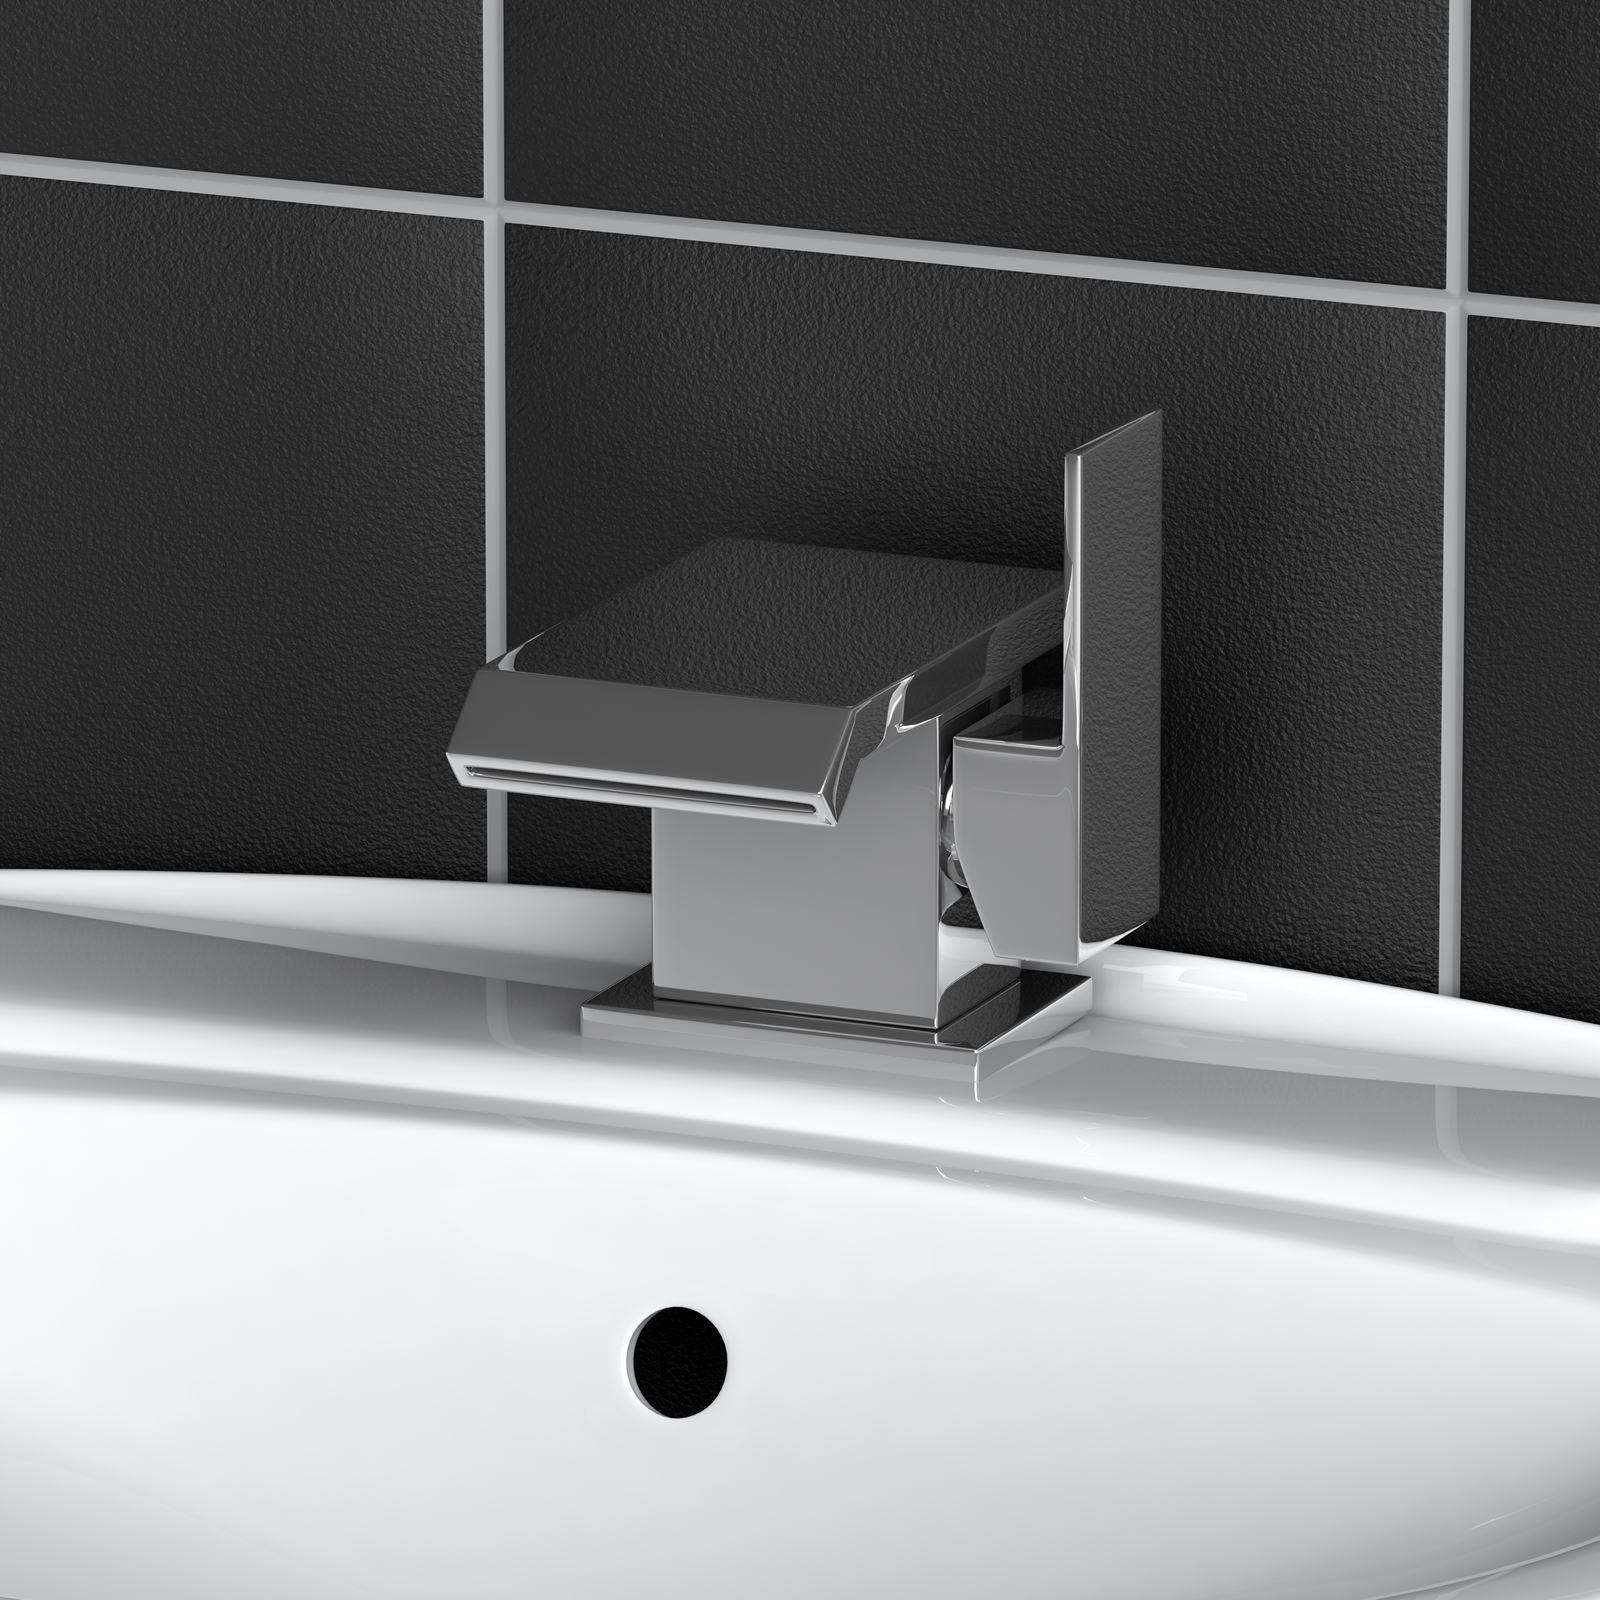 Wp01 chrome modern waterfall monobloc bathroom sink basin for Bathroom sink lever taps